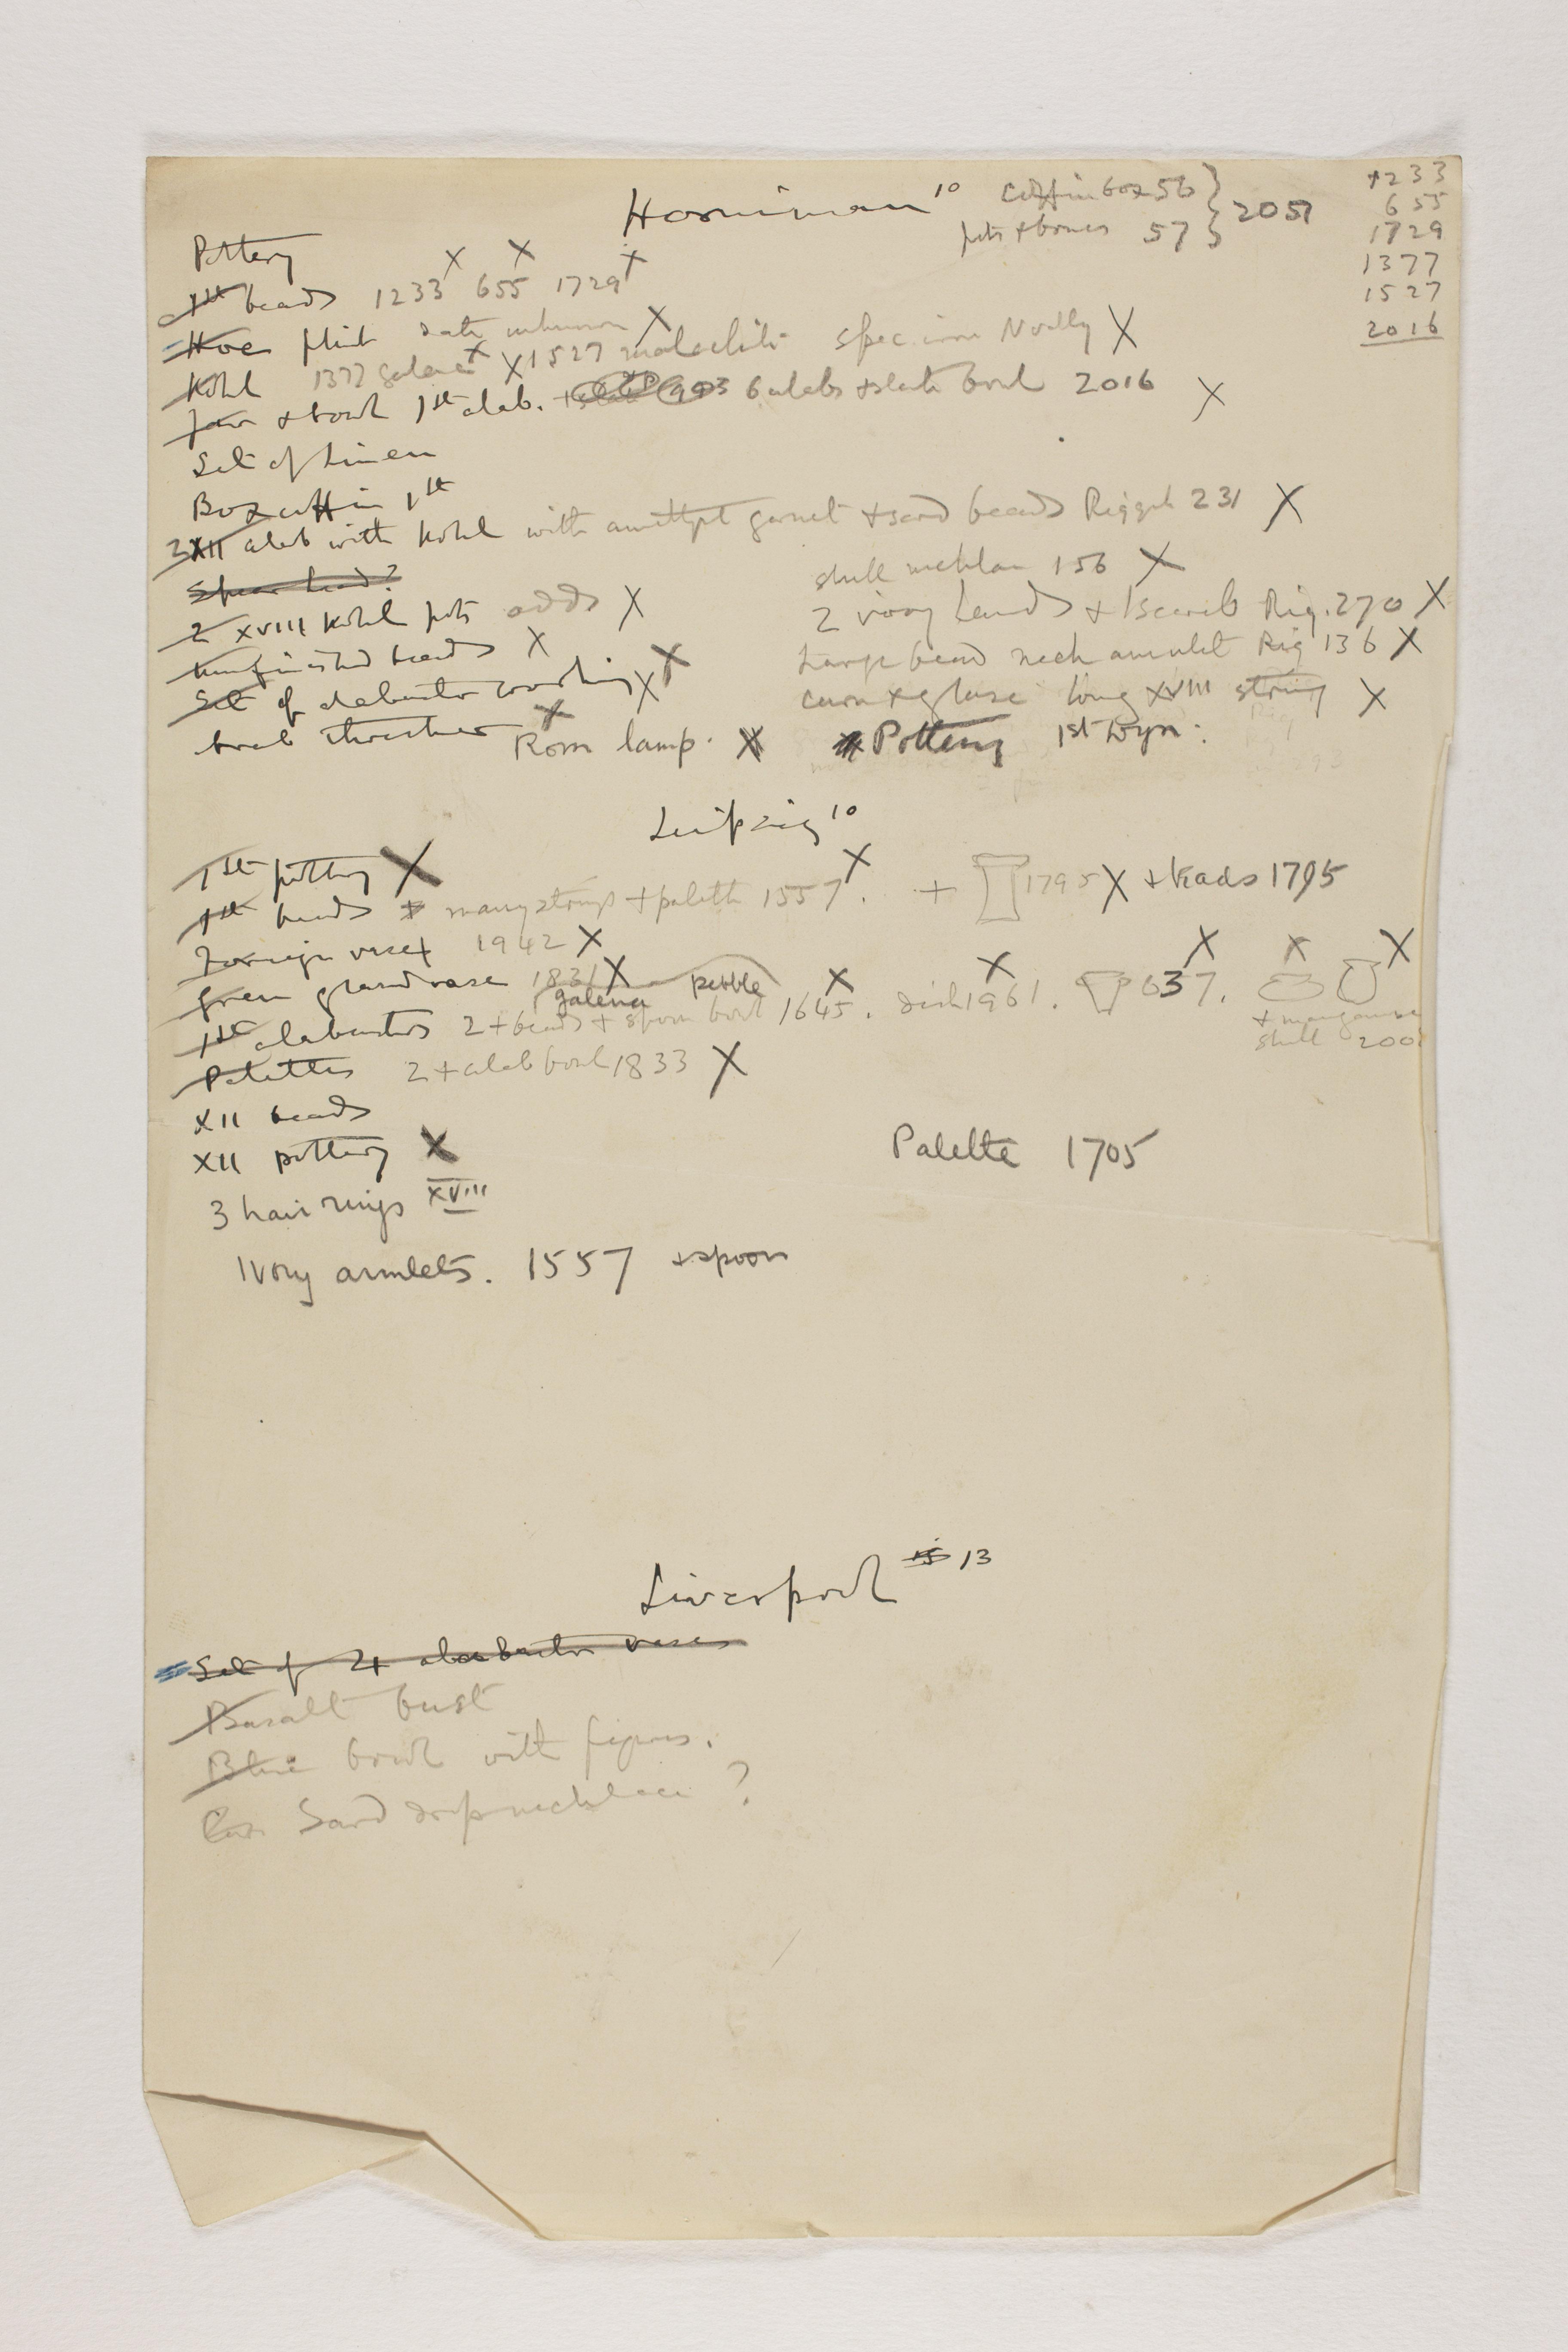 1912-13 Tarkhan, el-Riqqa, Memphis Multiple institution list PMA/WFP1/D/21/10